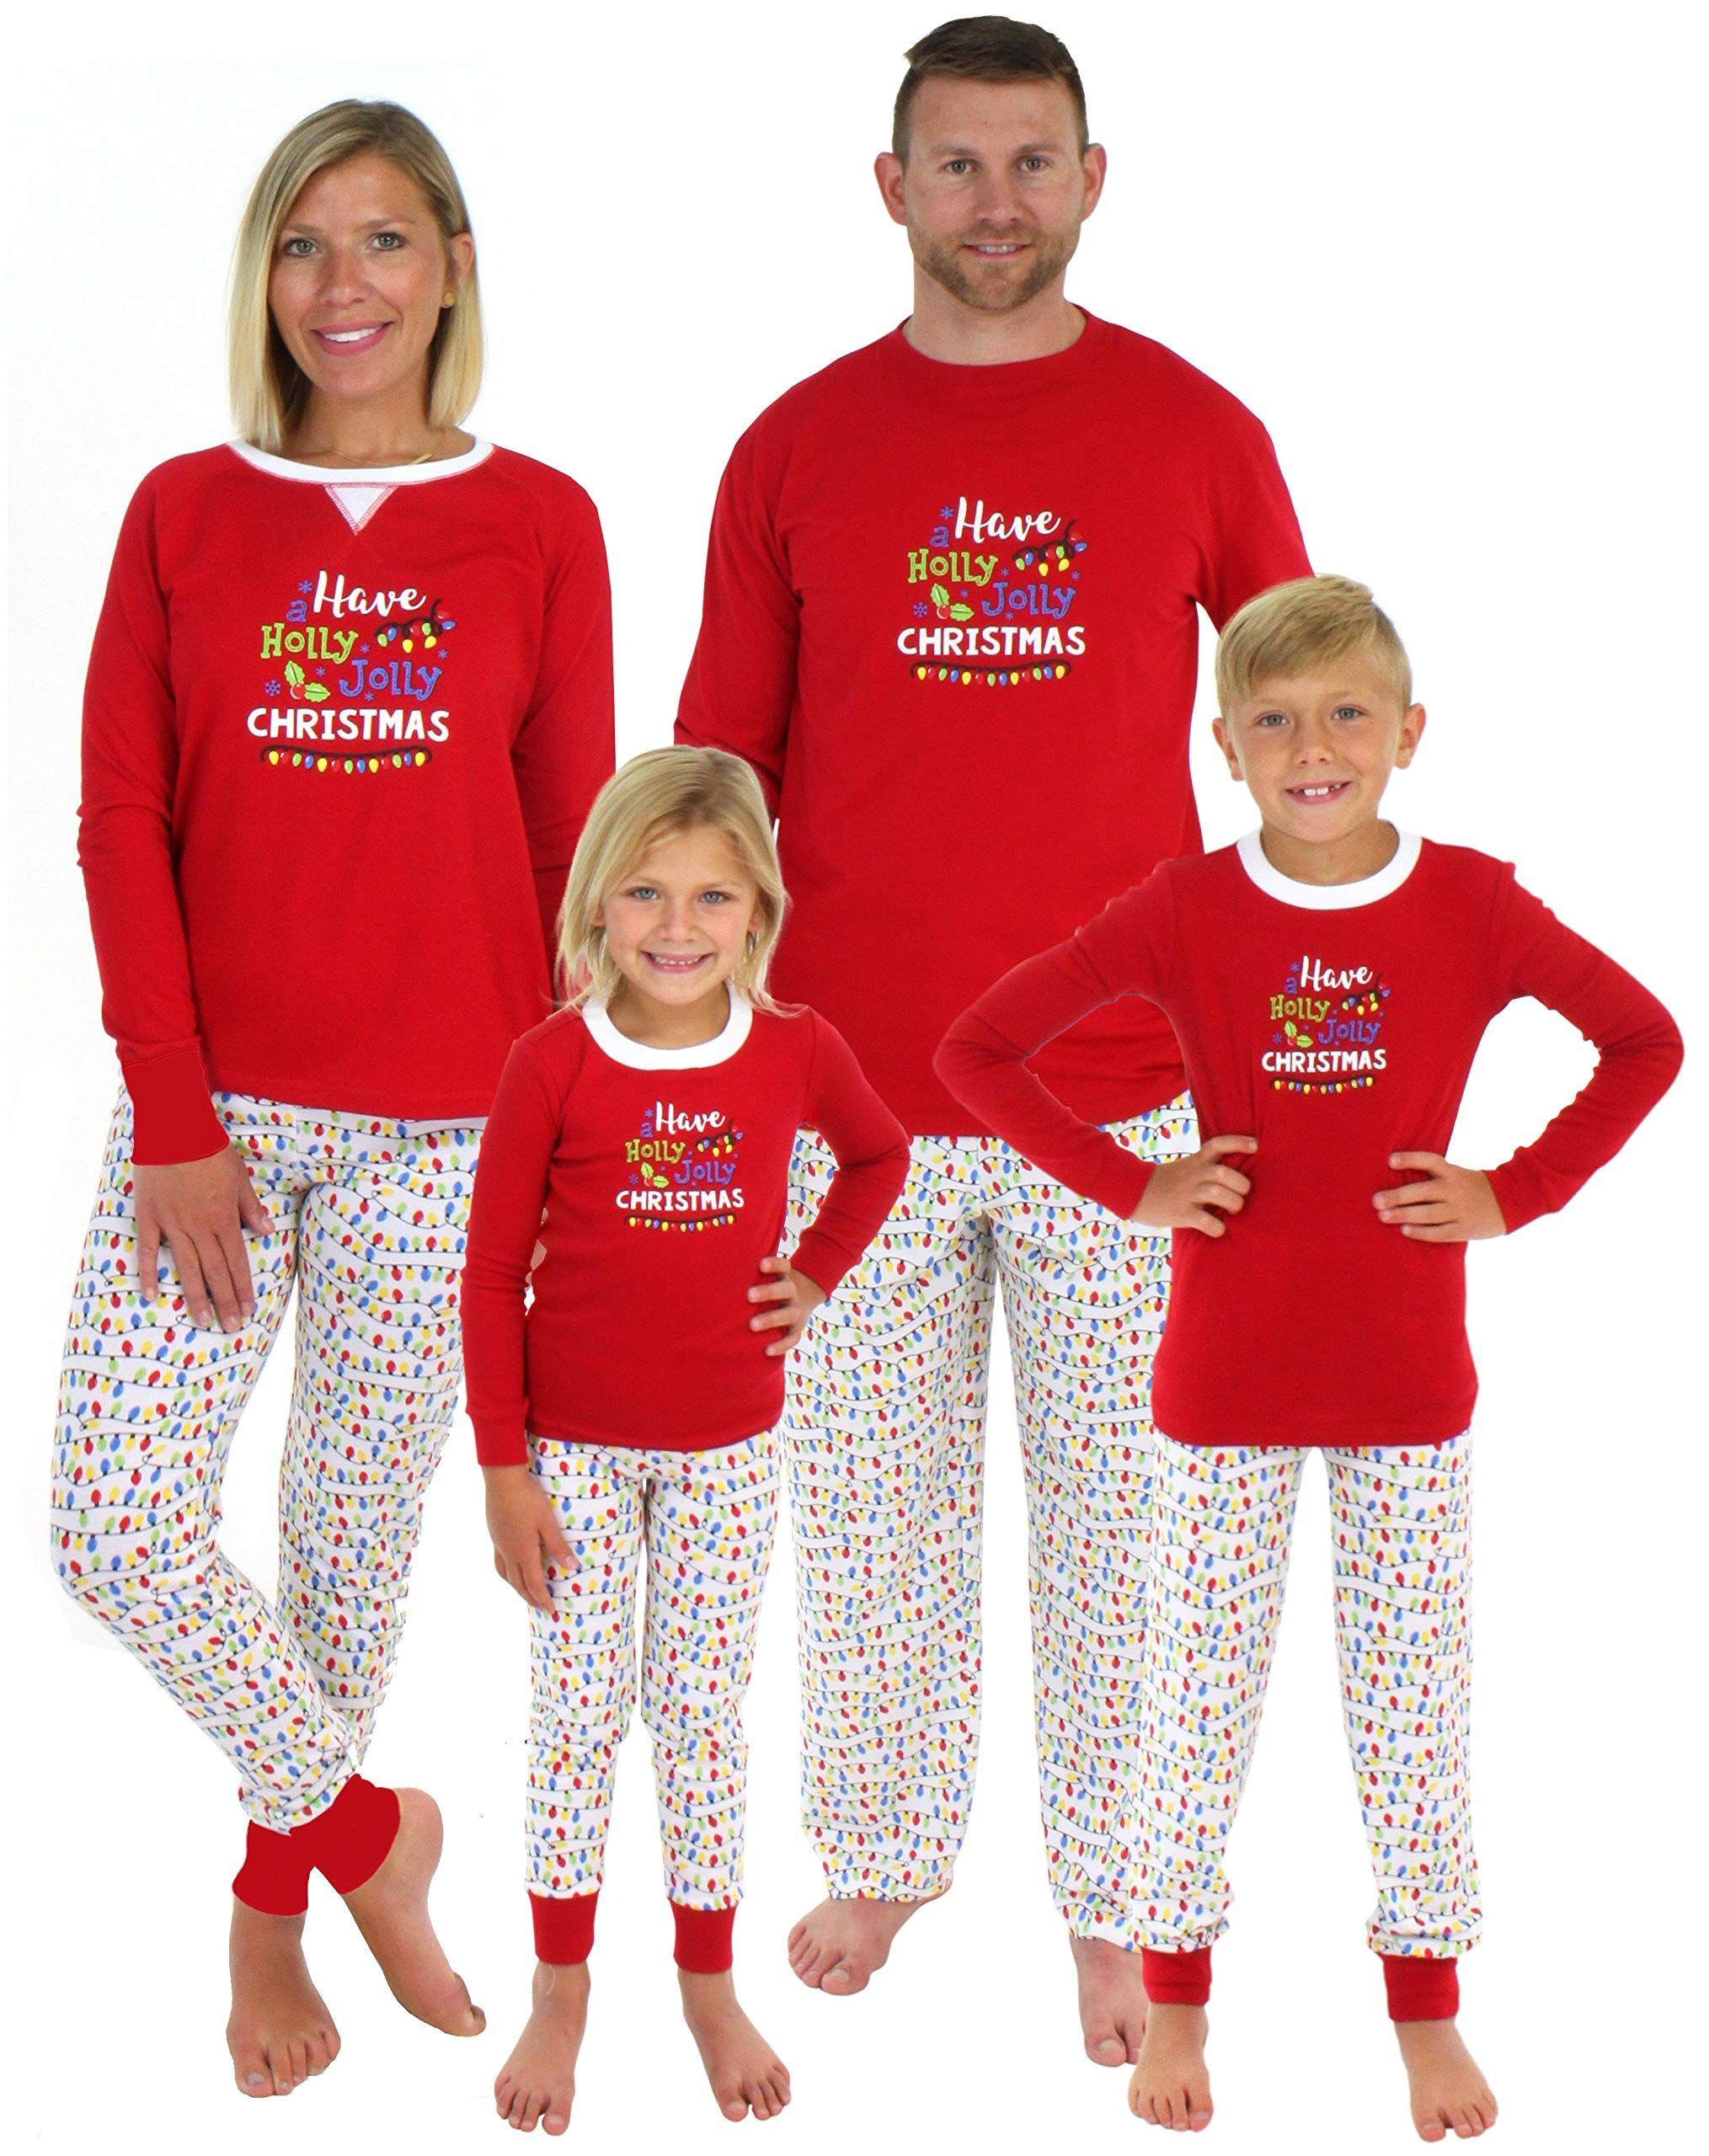 c872e01c01 Sleepyheads Family Matching Holly Jolly Christmas Lights Pajama PJ Sets